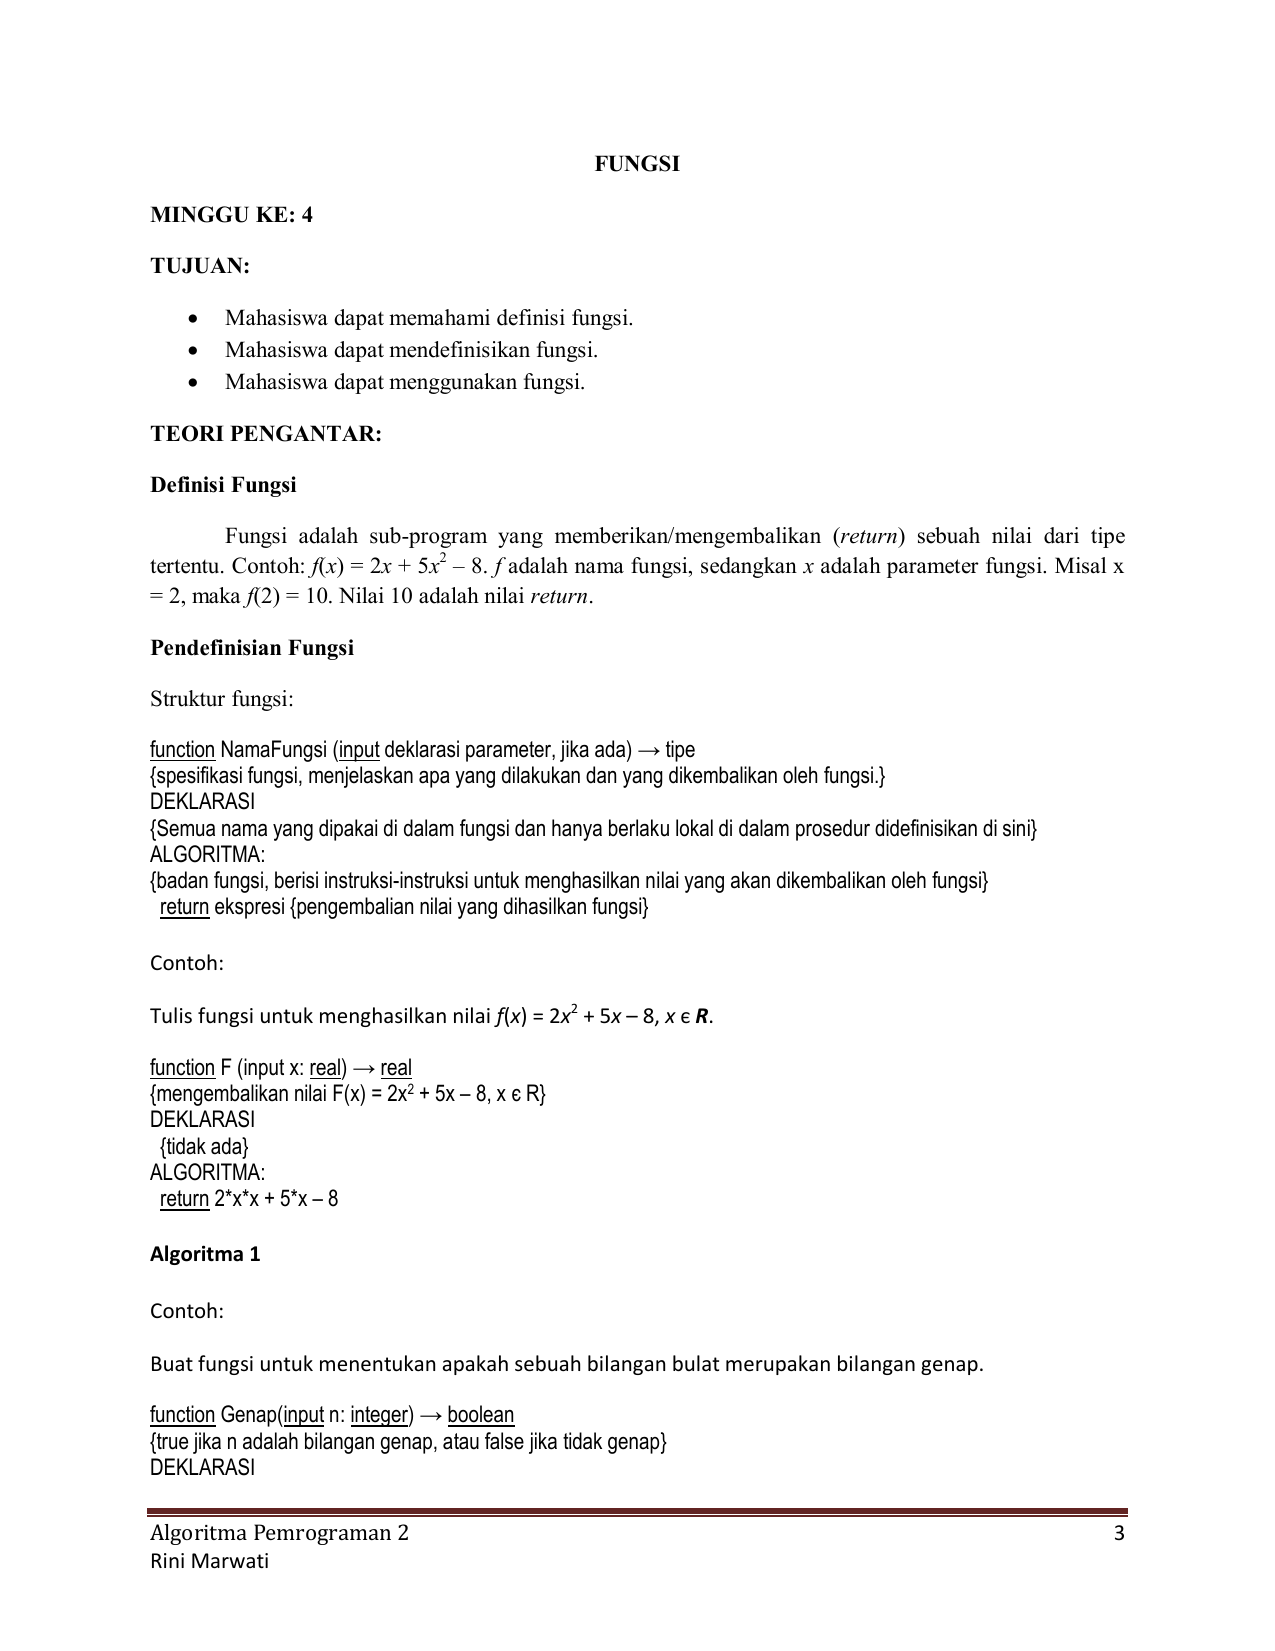 Algoritma Pemrograman 2 3 Rini Marwati Fungsi